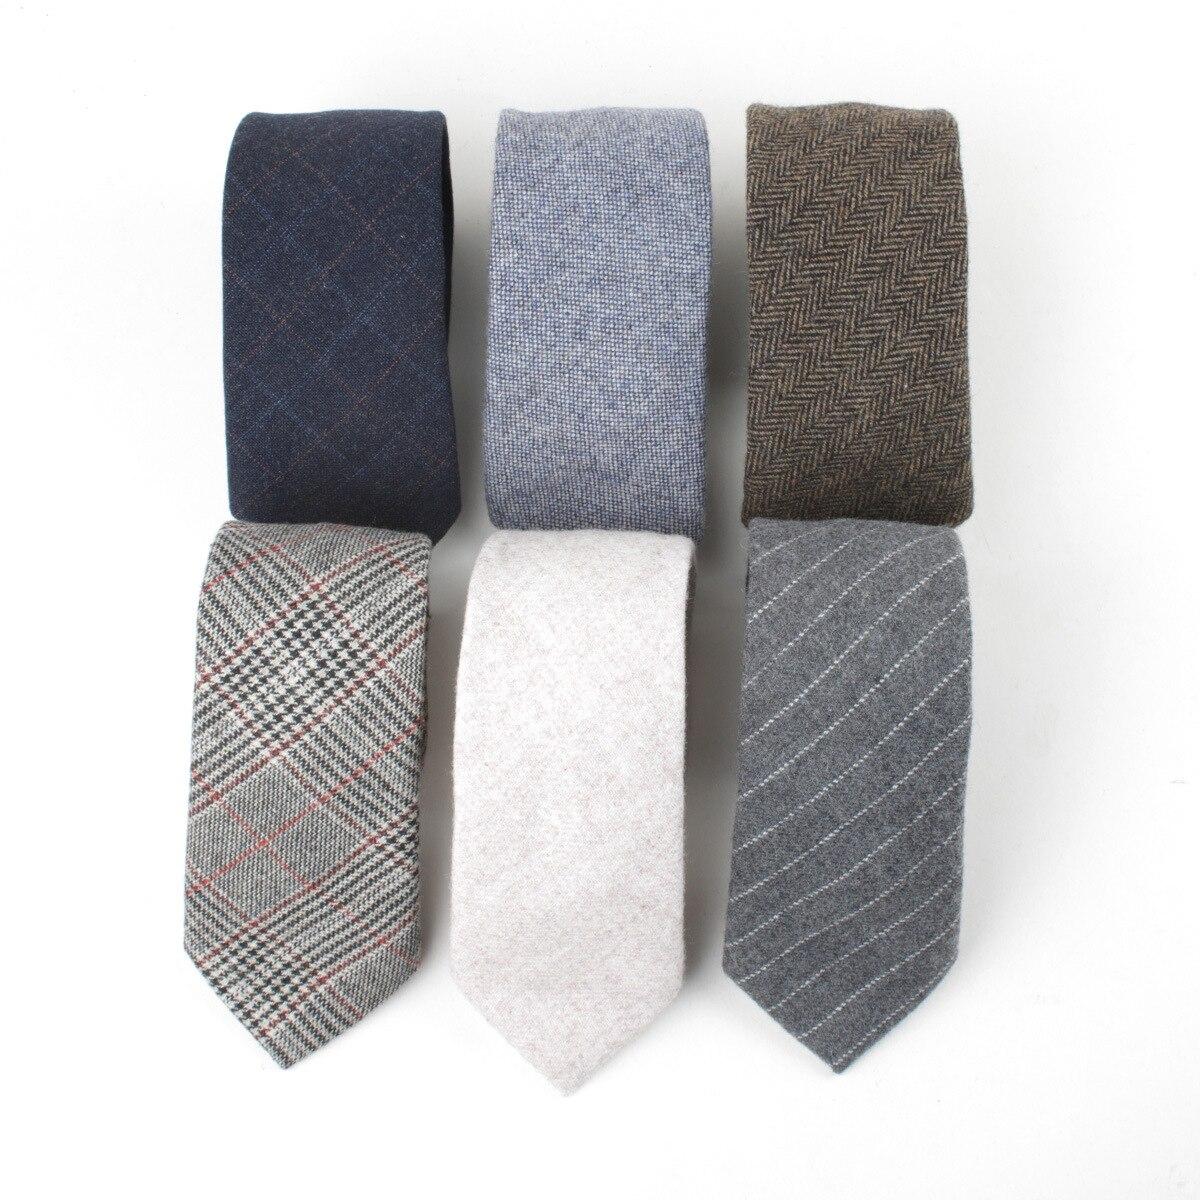 Linbaiway gravata de lã para festa casual masculino jacquard lã gravatas camisa gravata negócios gravatas logotipo personalizado